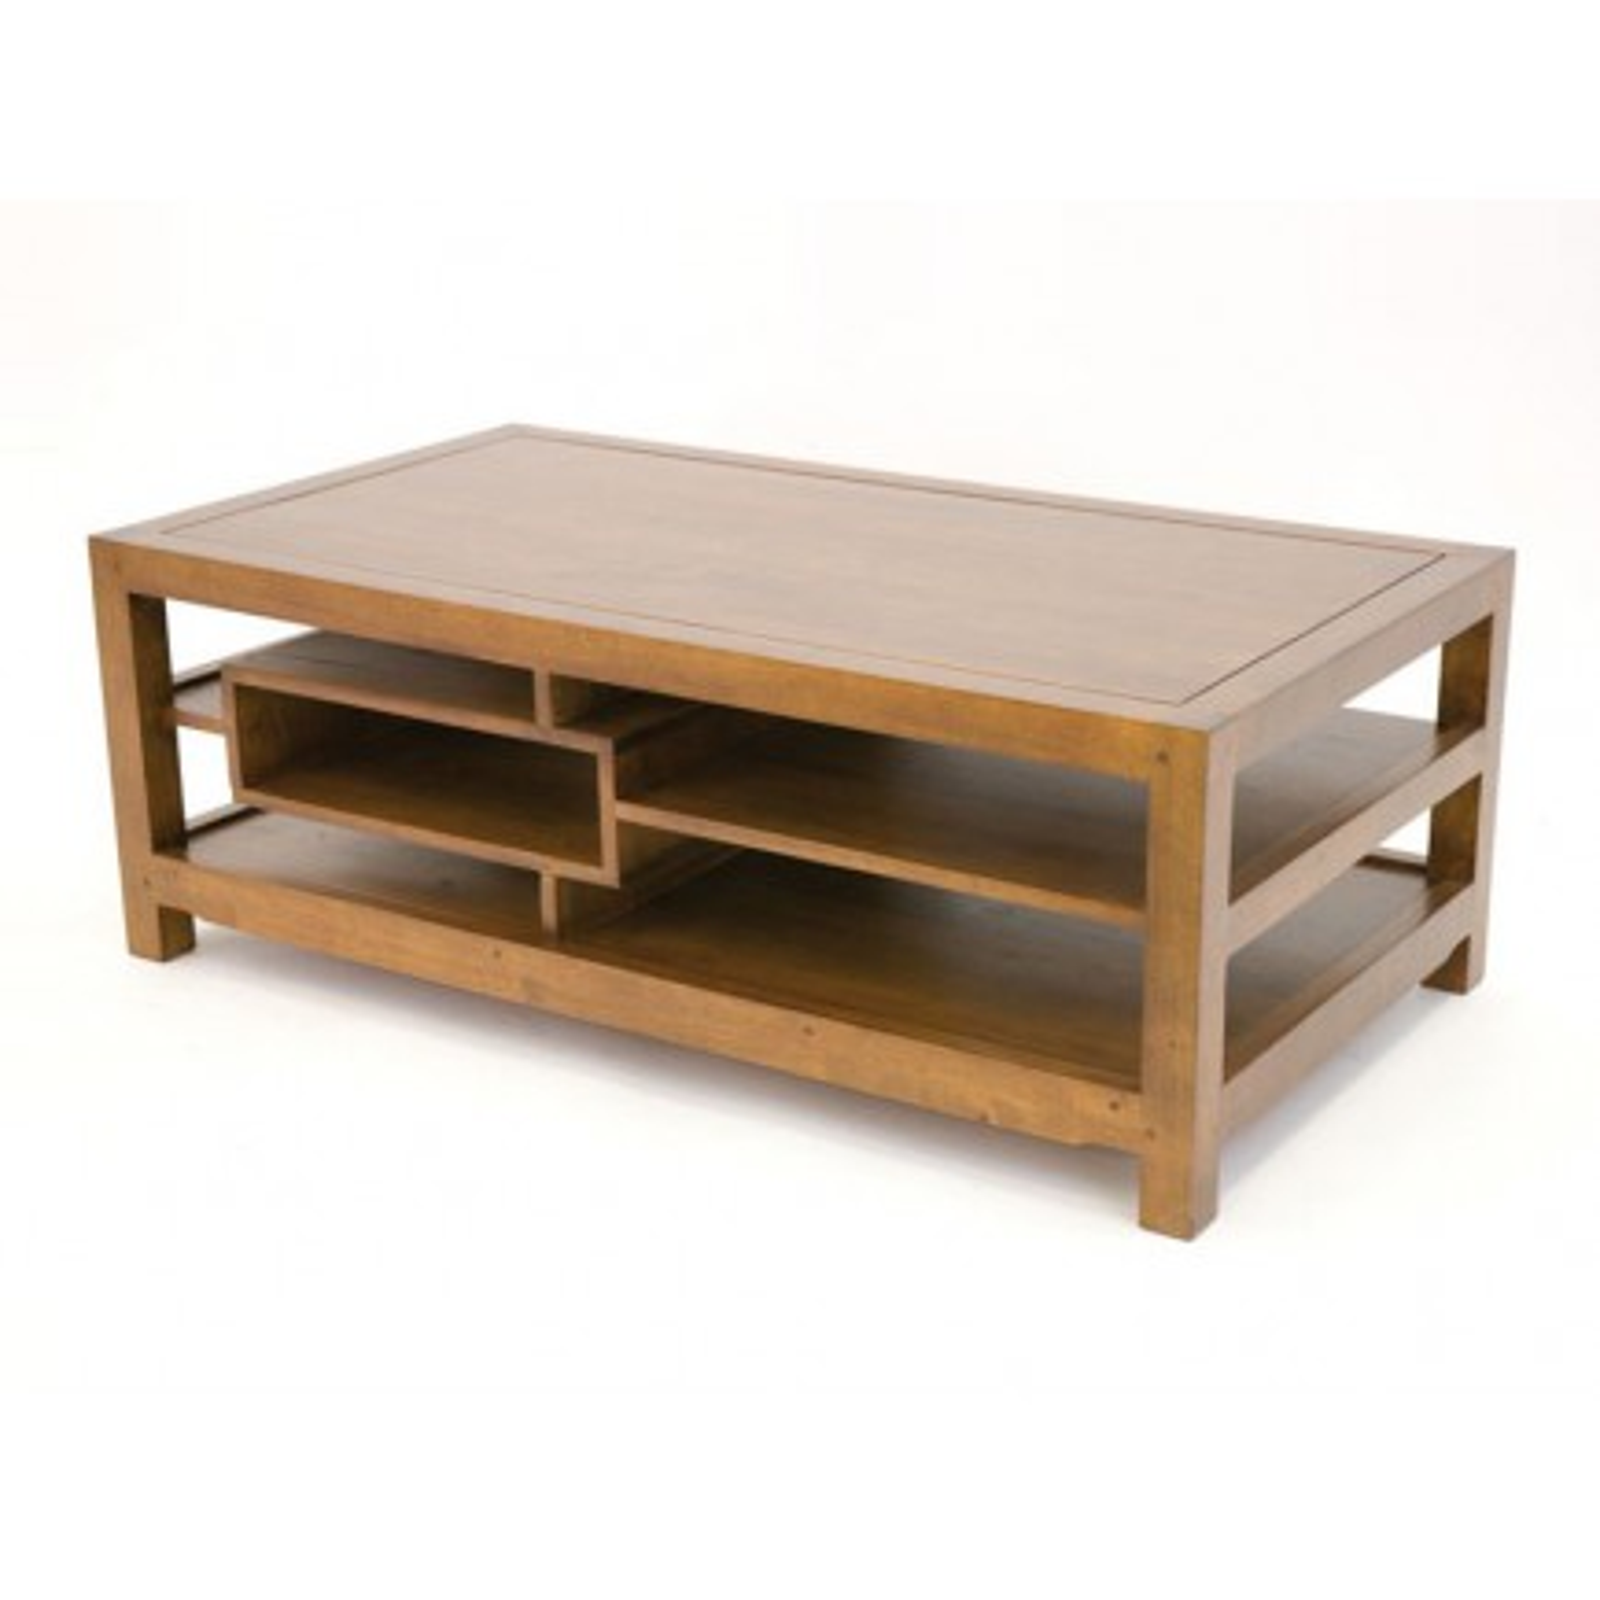 Table basse Design Fjord Hévéa - meuble déco